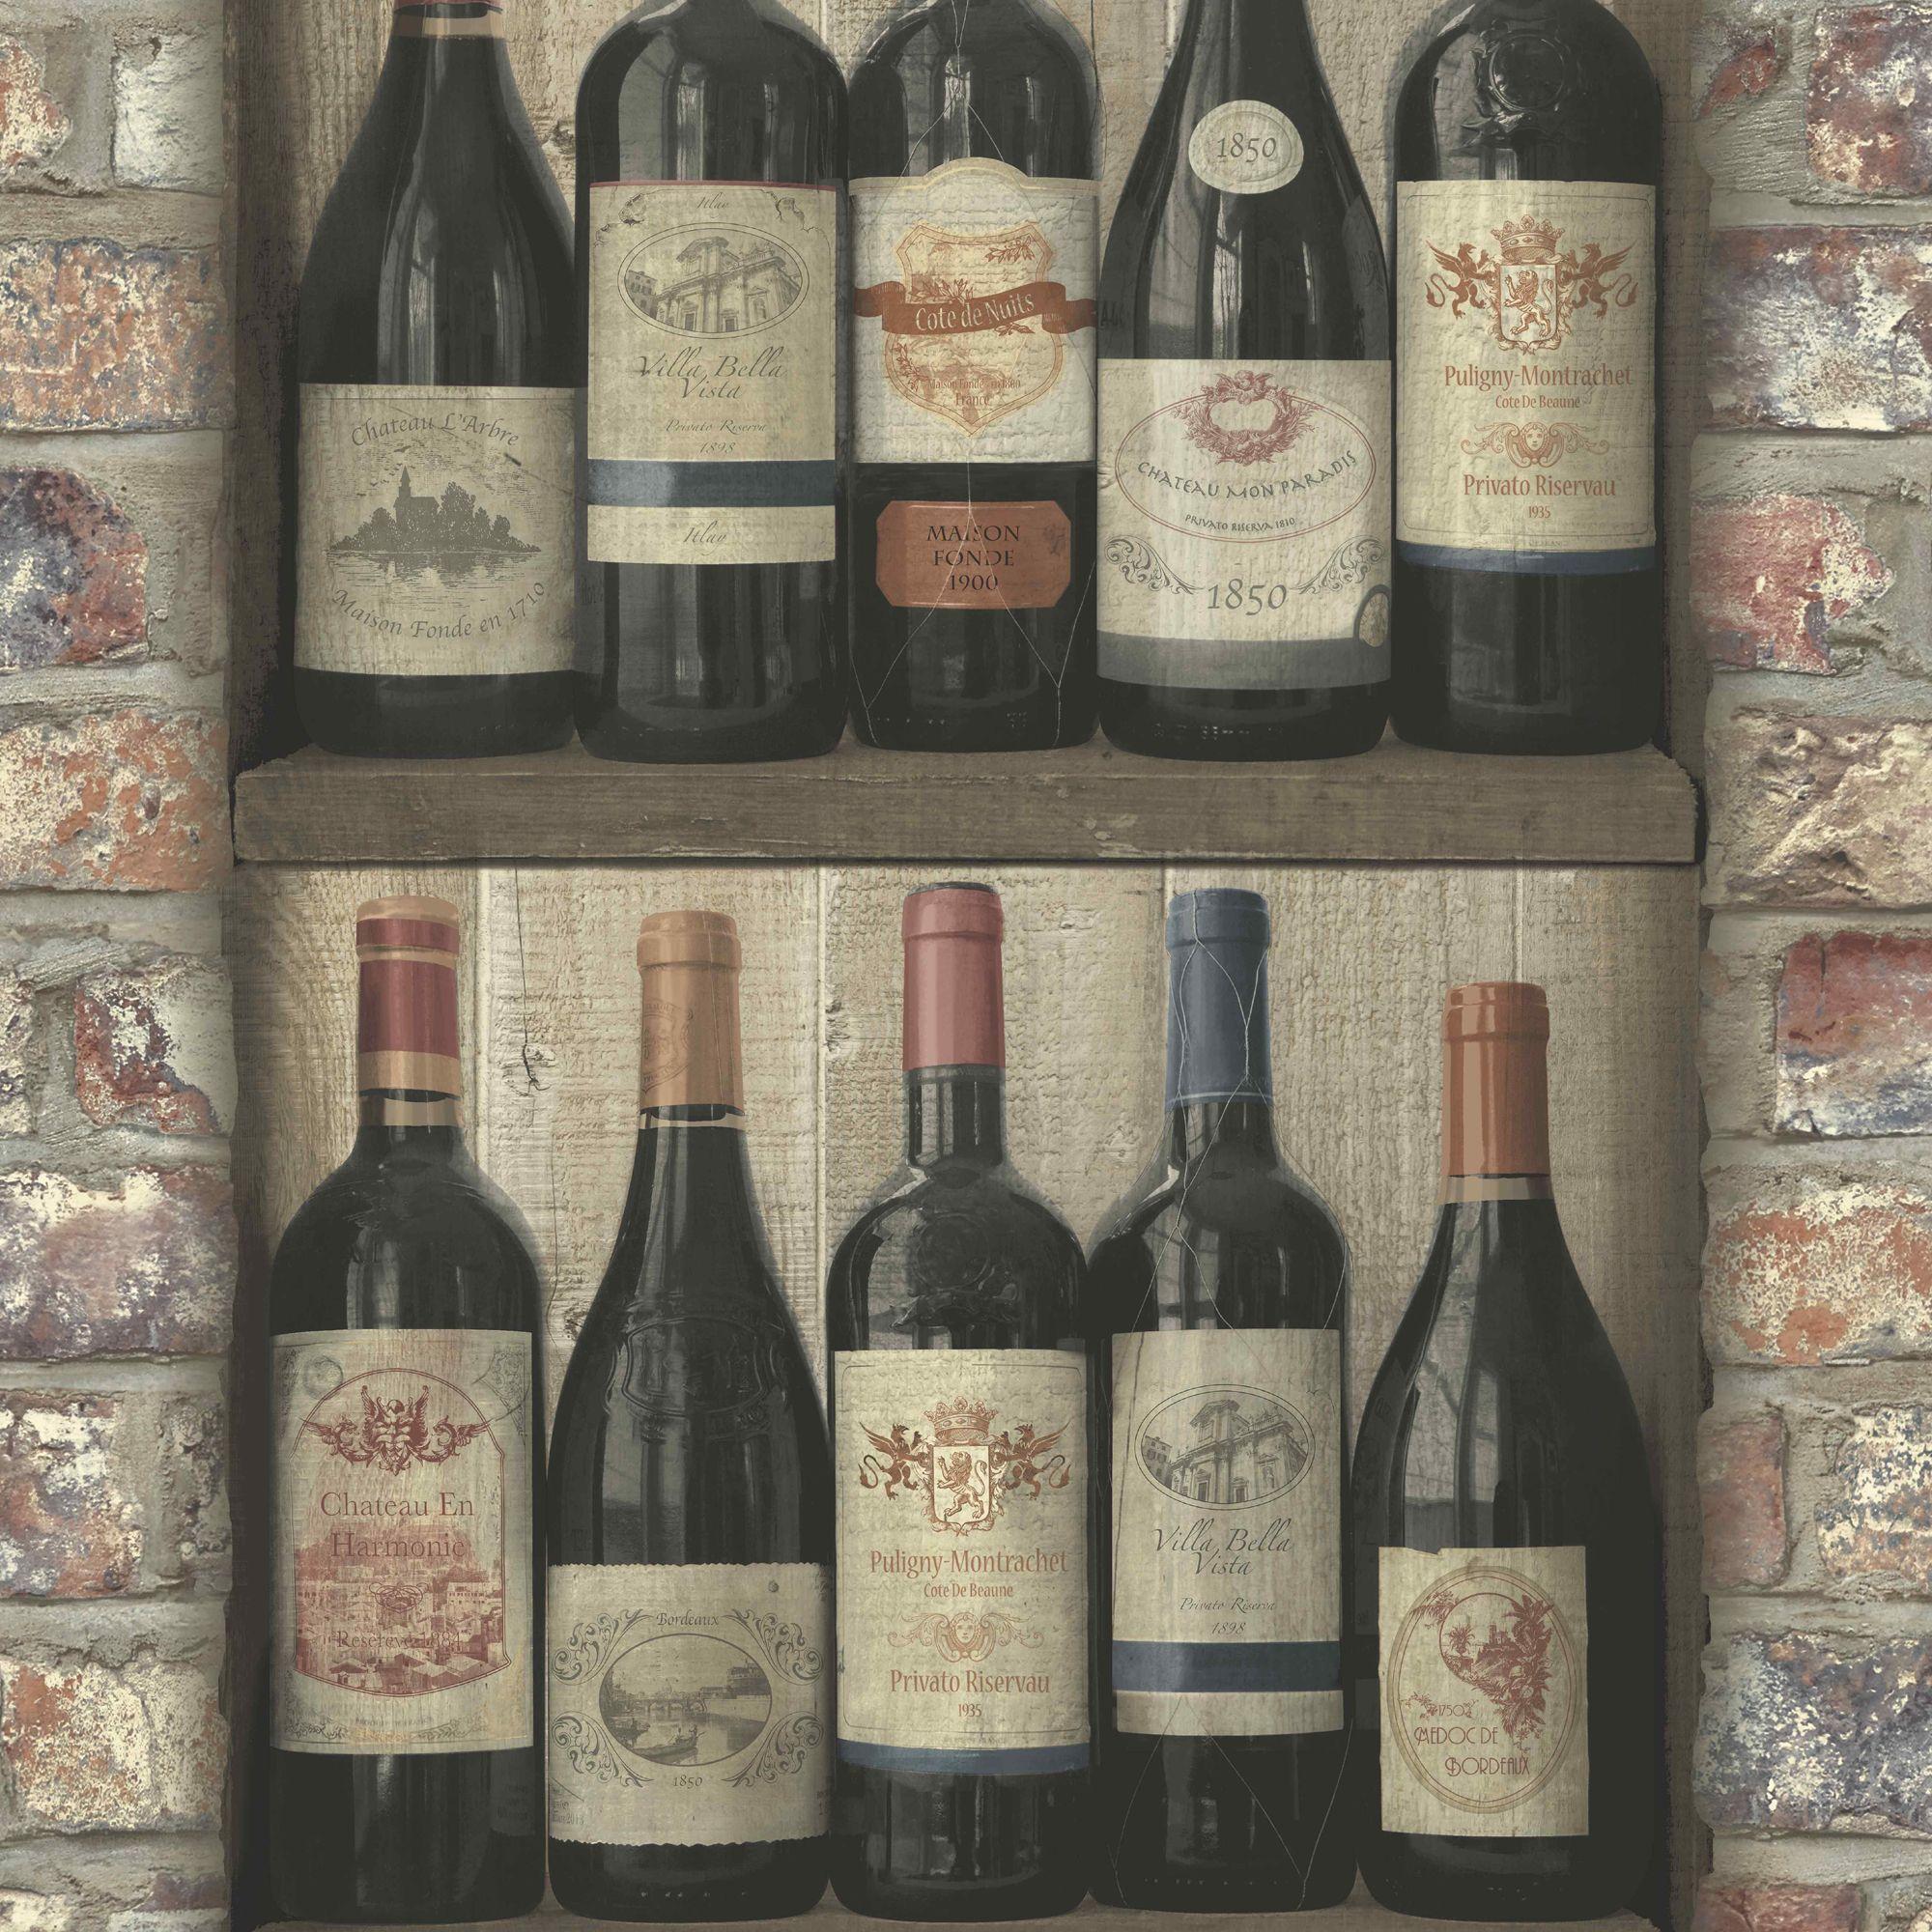 wallpaper wine red bottle - photo #23